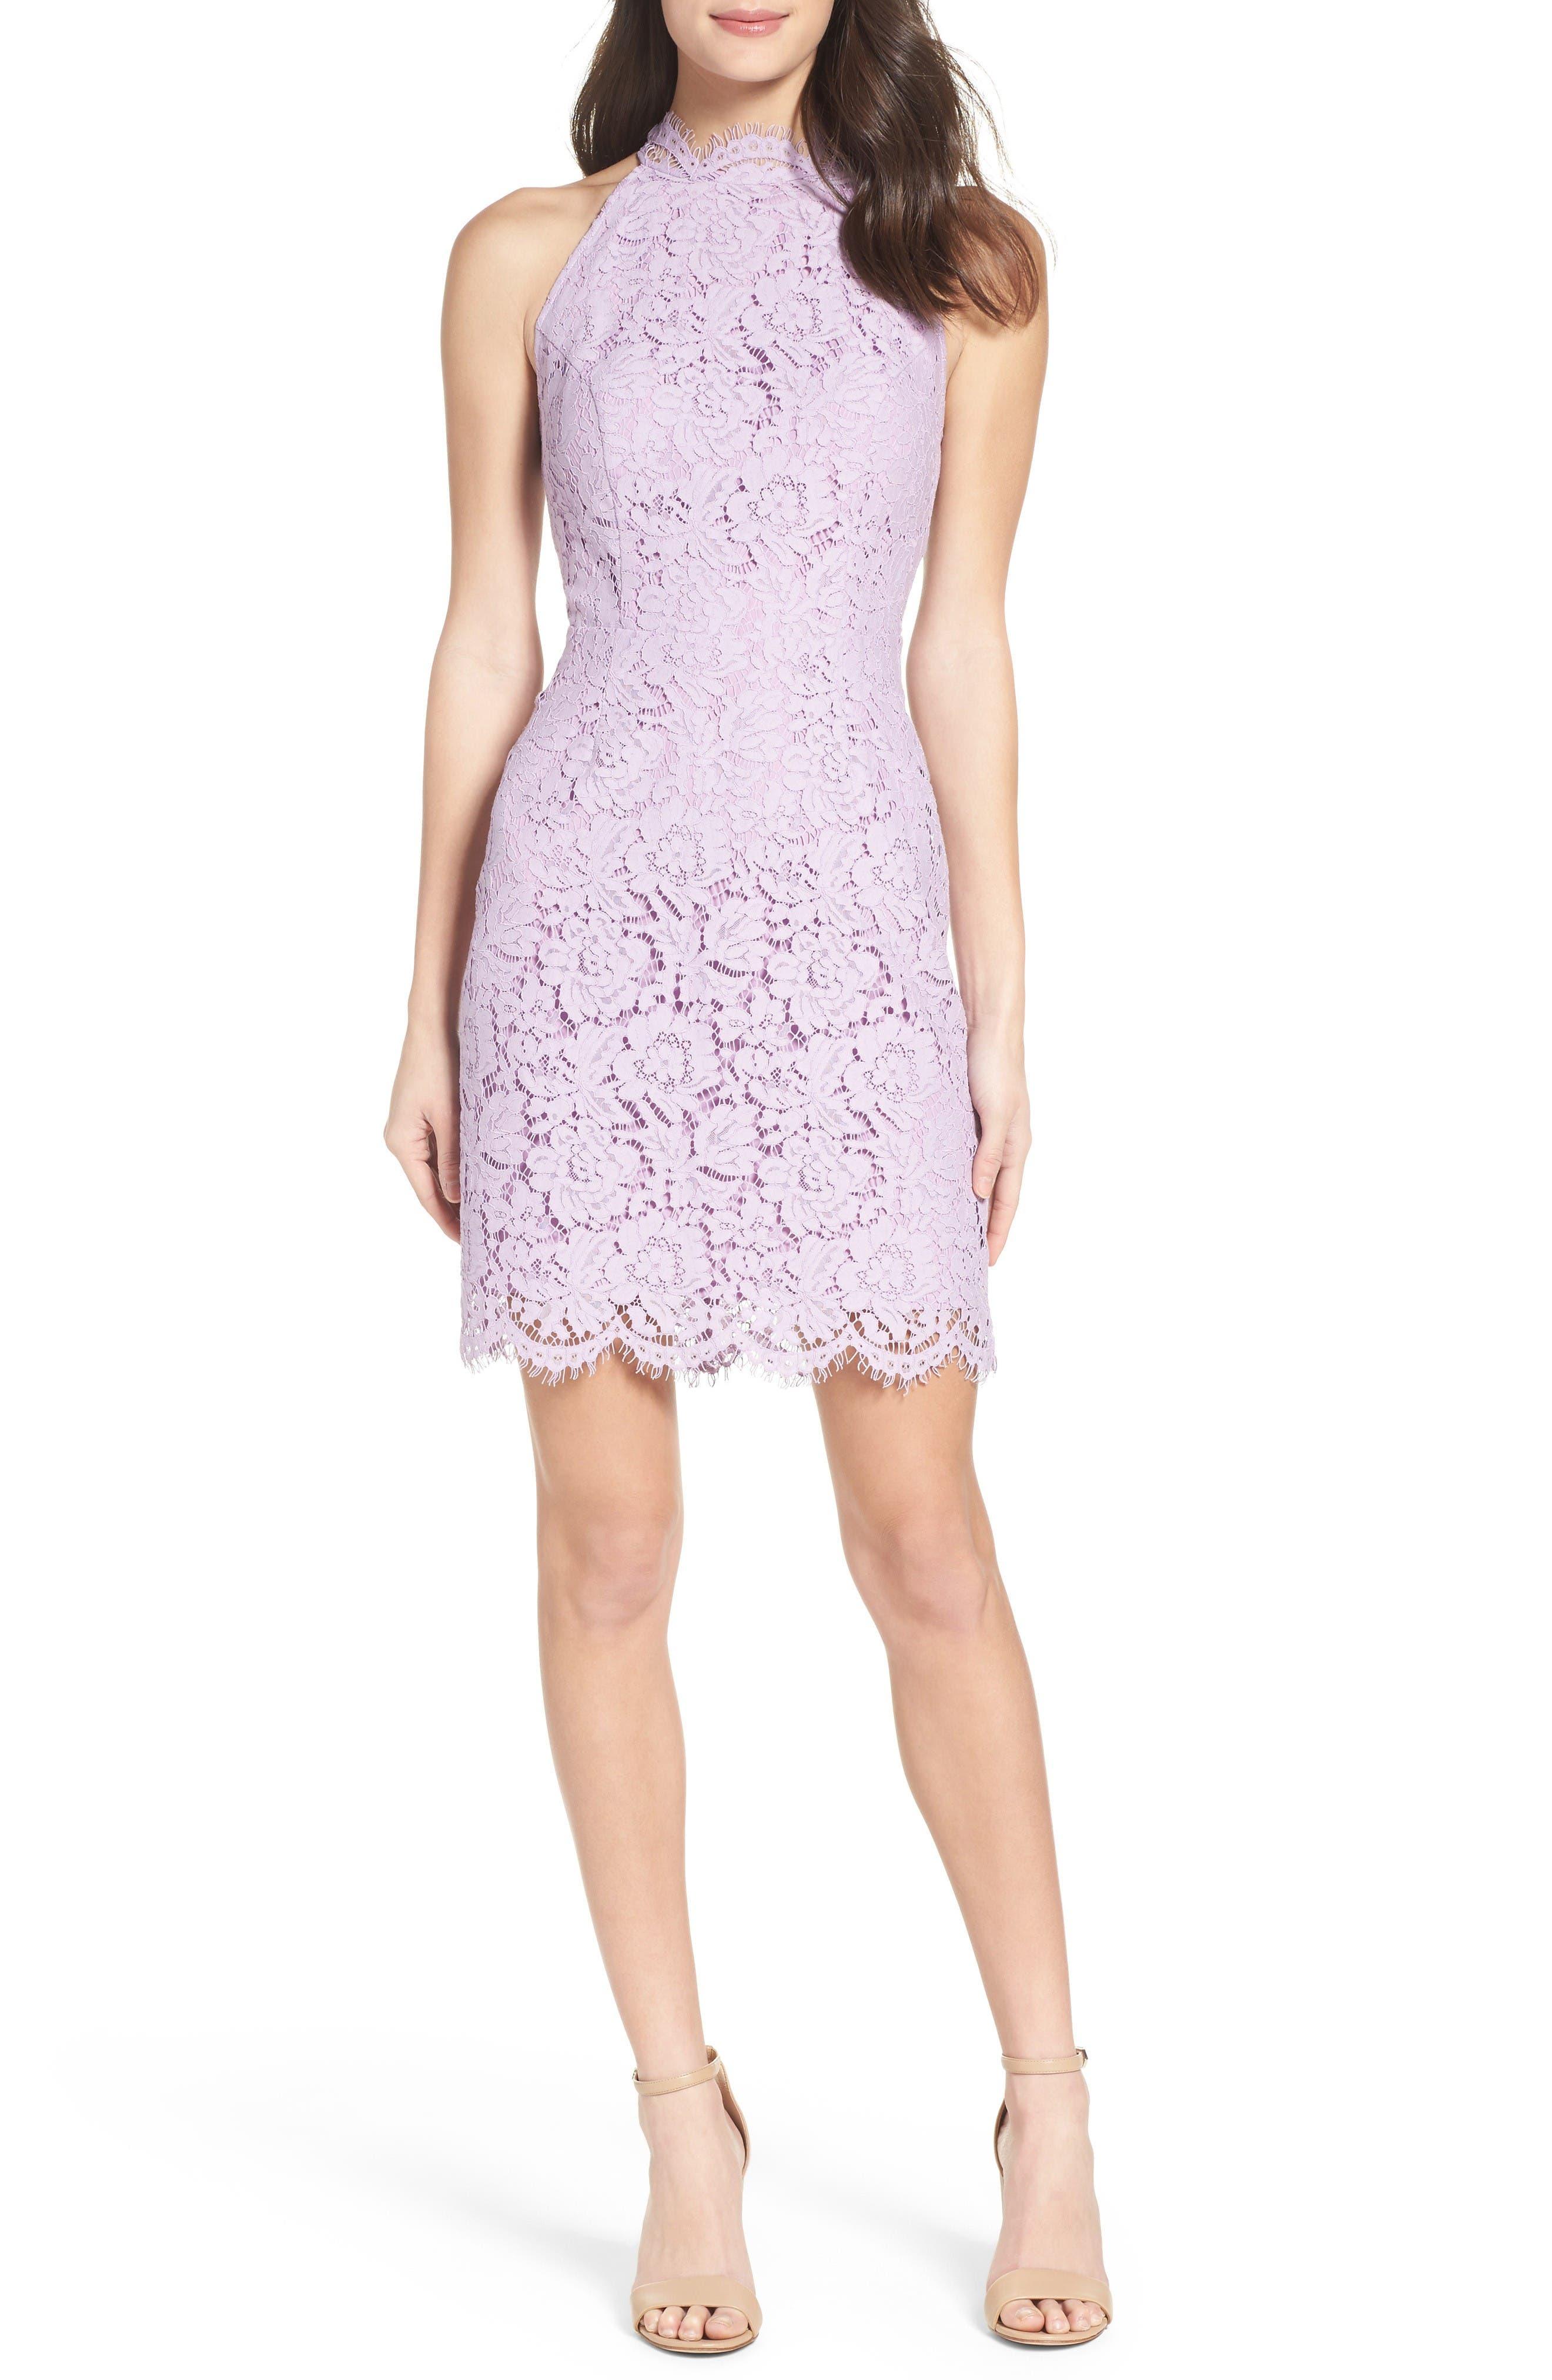 'Cara' High Neck Lace Dress,                         Main,                         color, Lavender